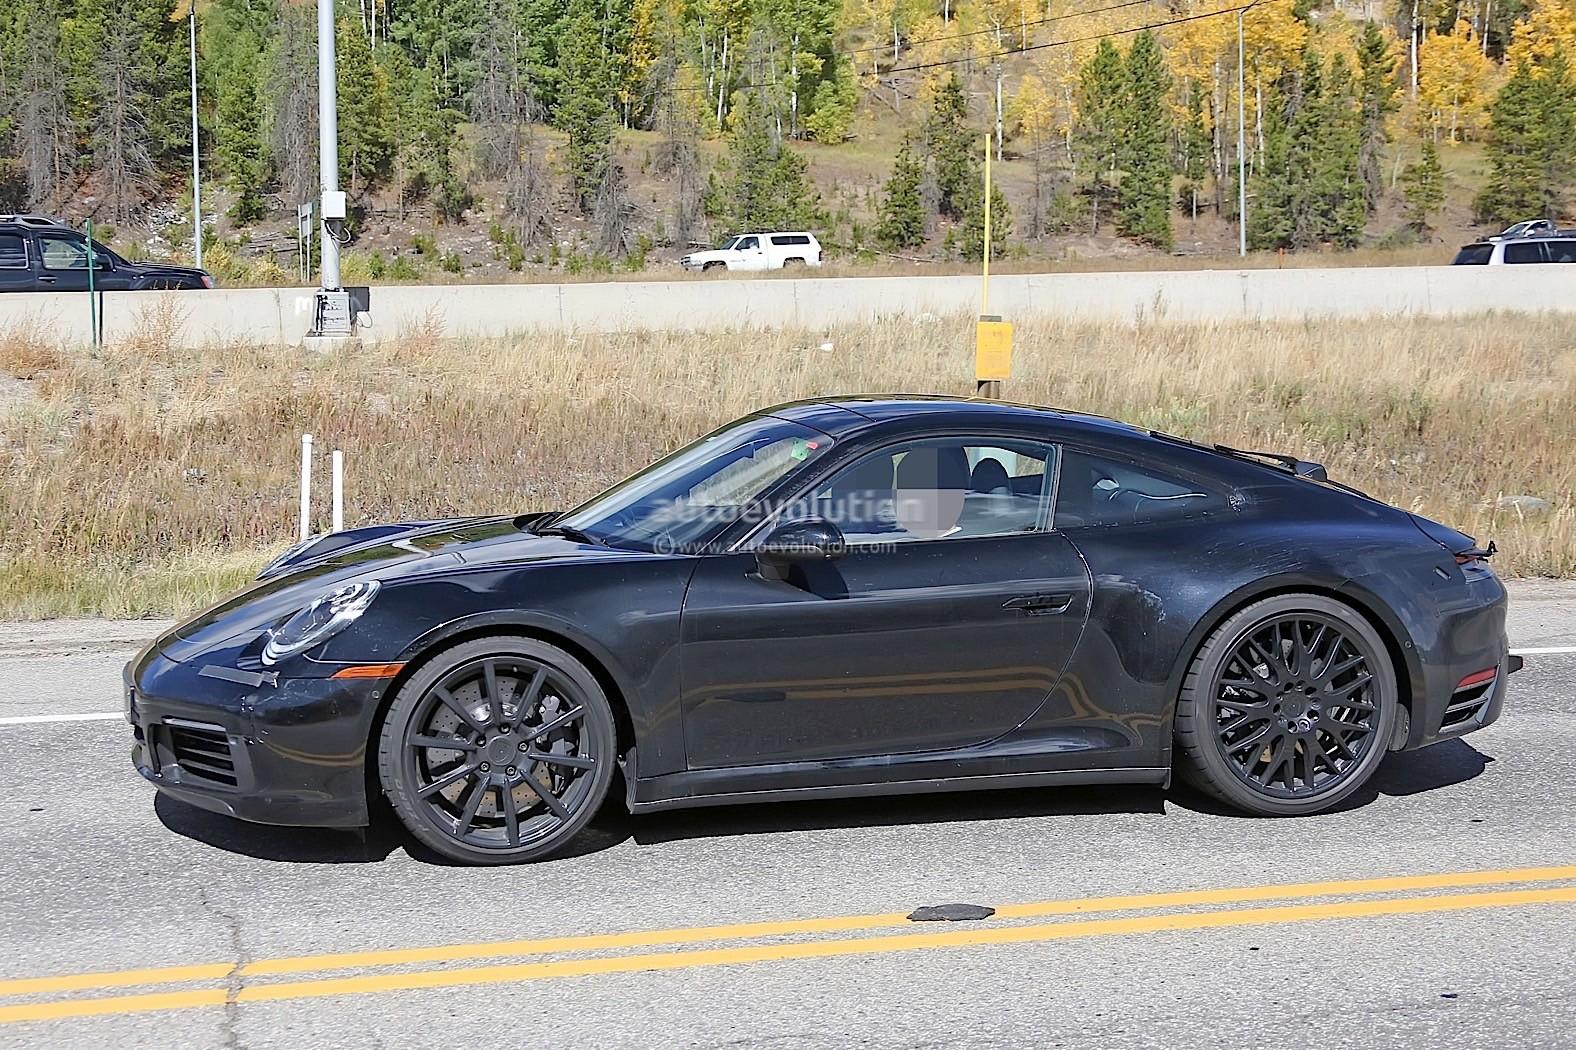 2019 porsche 911 spied at nurburgring gets closer to production autoevolution. Black Bedroom Furniture Sets. Home Design Ideas